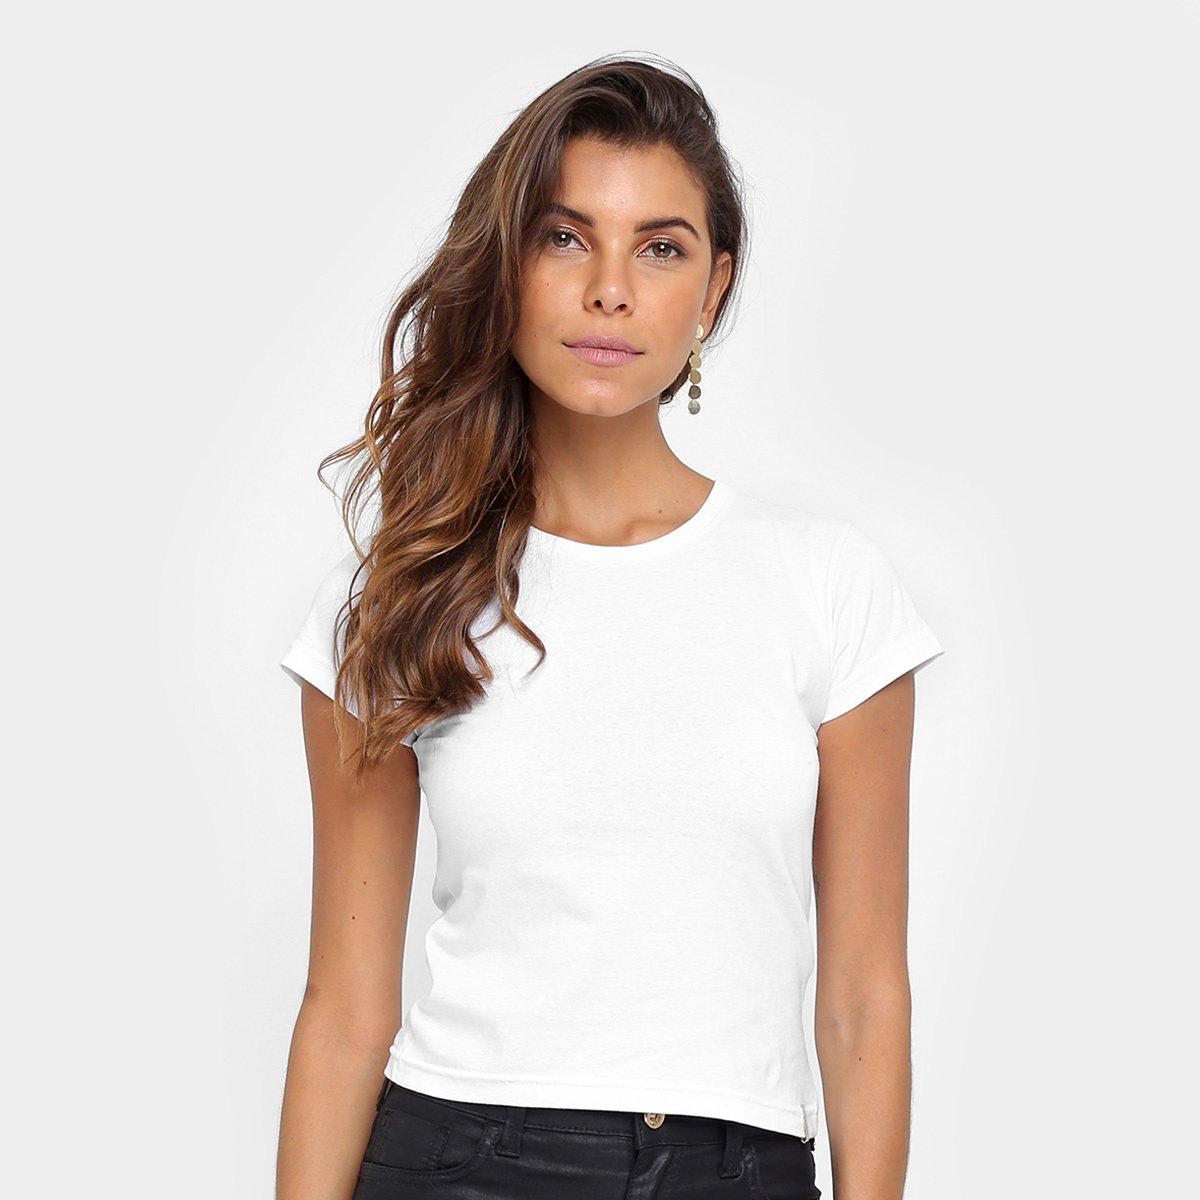 4c33012740cd6 Camiseta Tig's Gola Redonda Manga Curta Feminina - Compre Agora ...